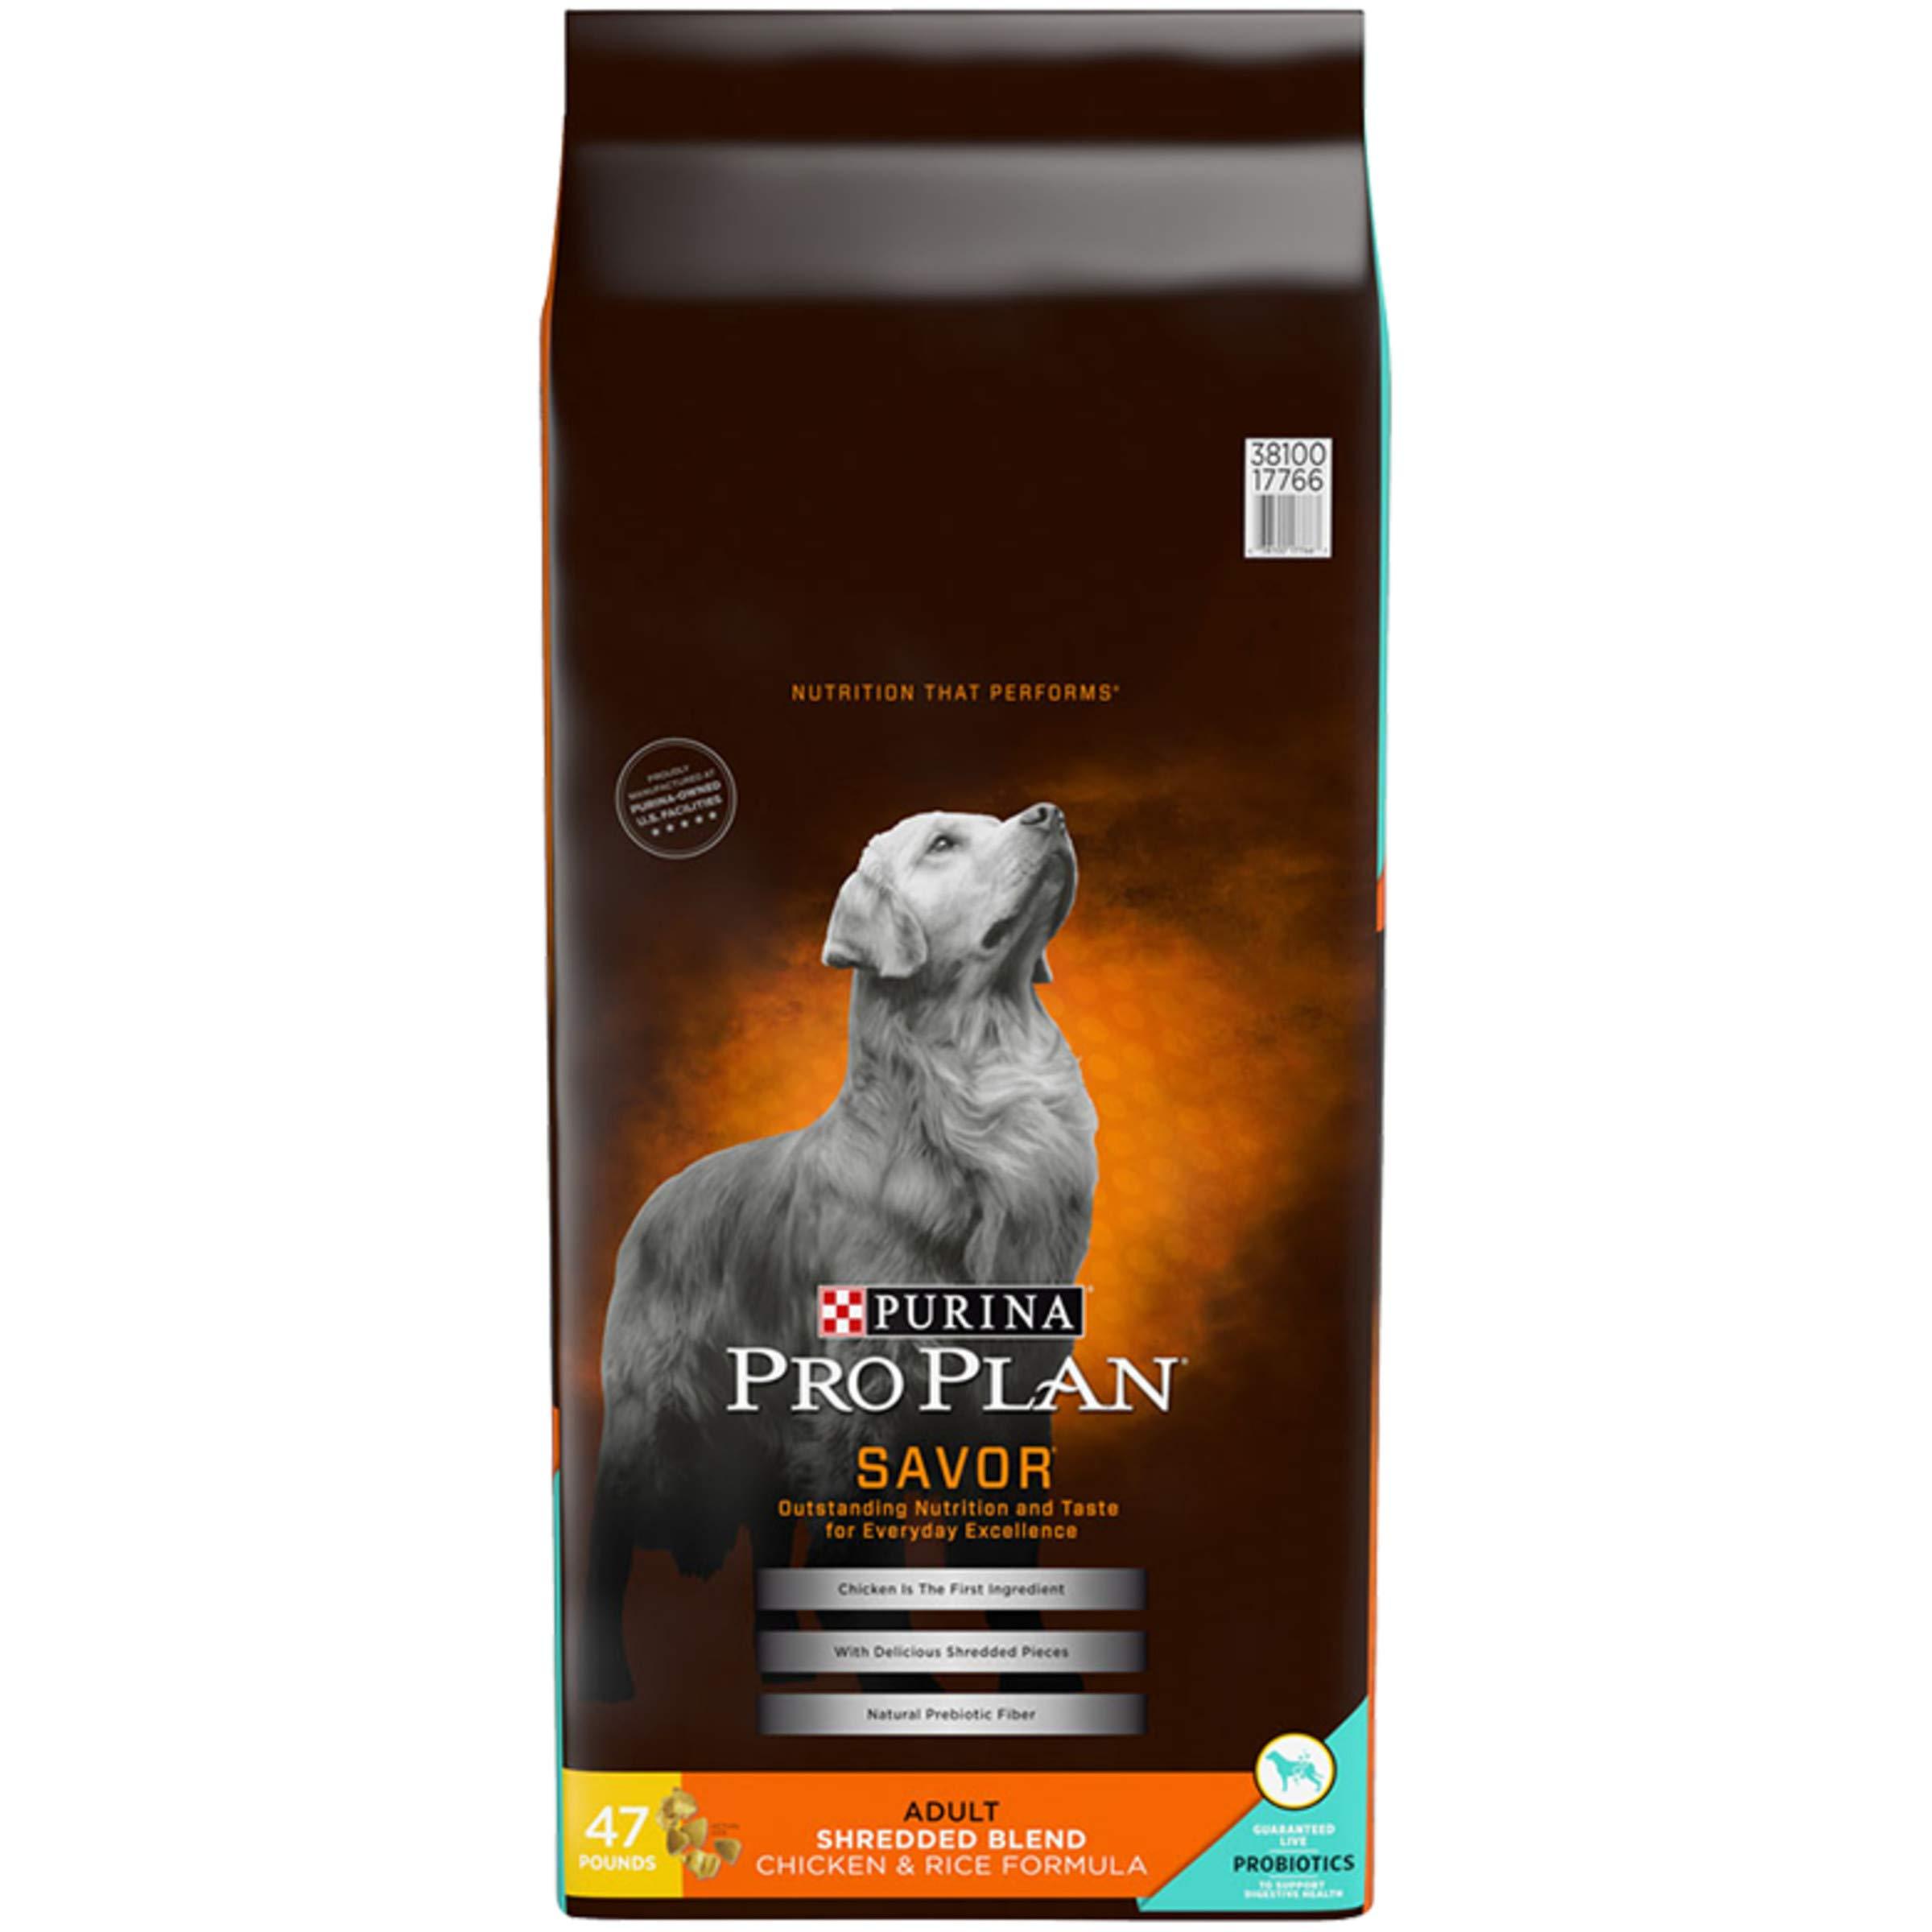 Purina Pro Plan With Probiotics Dry Dog Food, SAVOR Shredded Blend Chicken & Rice Formula - 47 lb. Bag by PURINA Pro Plan